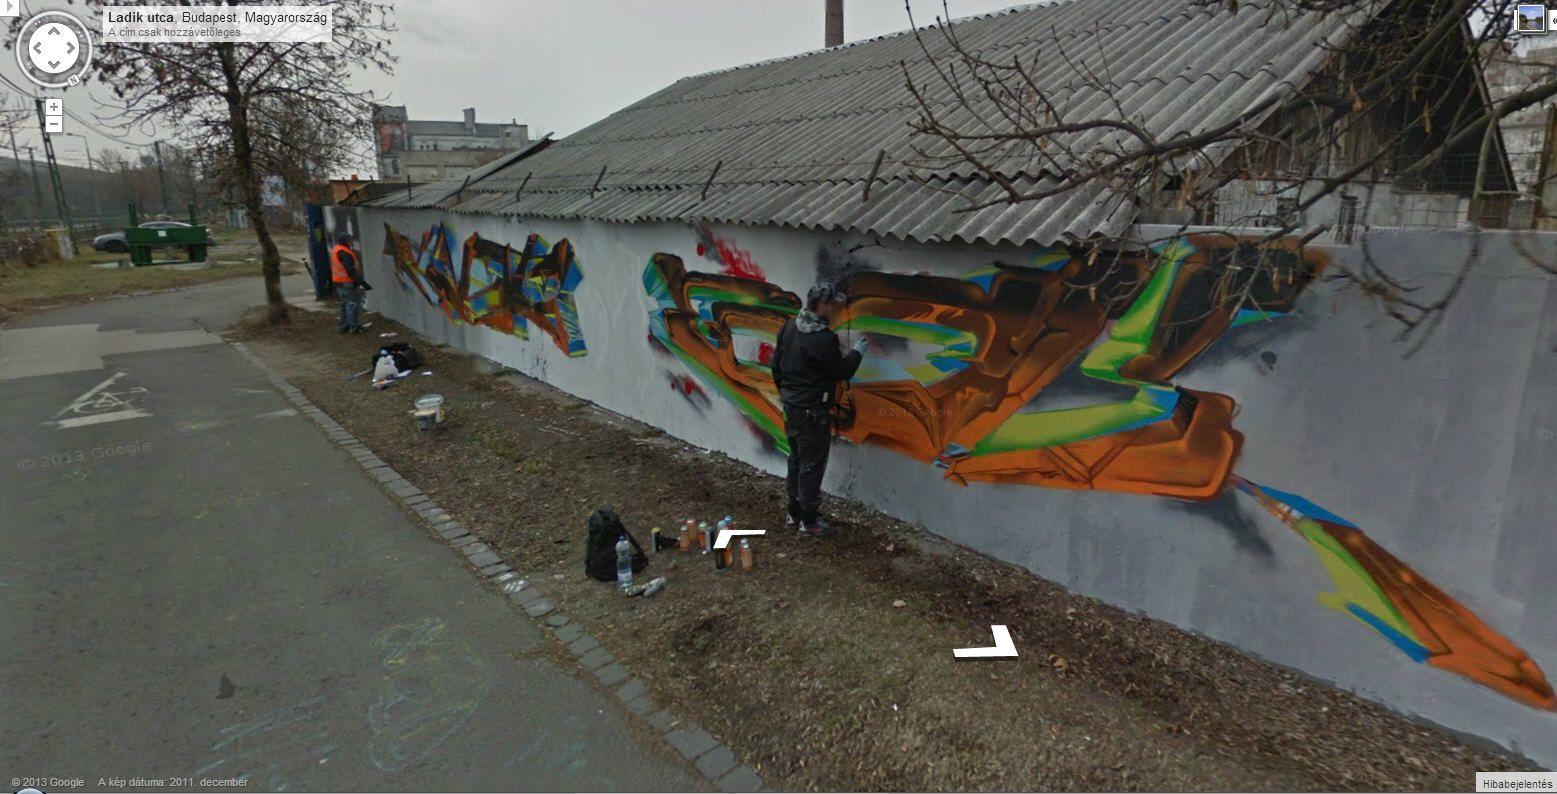 Fotó: Google Street View <br />Magyarország, Budapest, Ladik utca